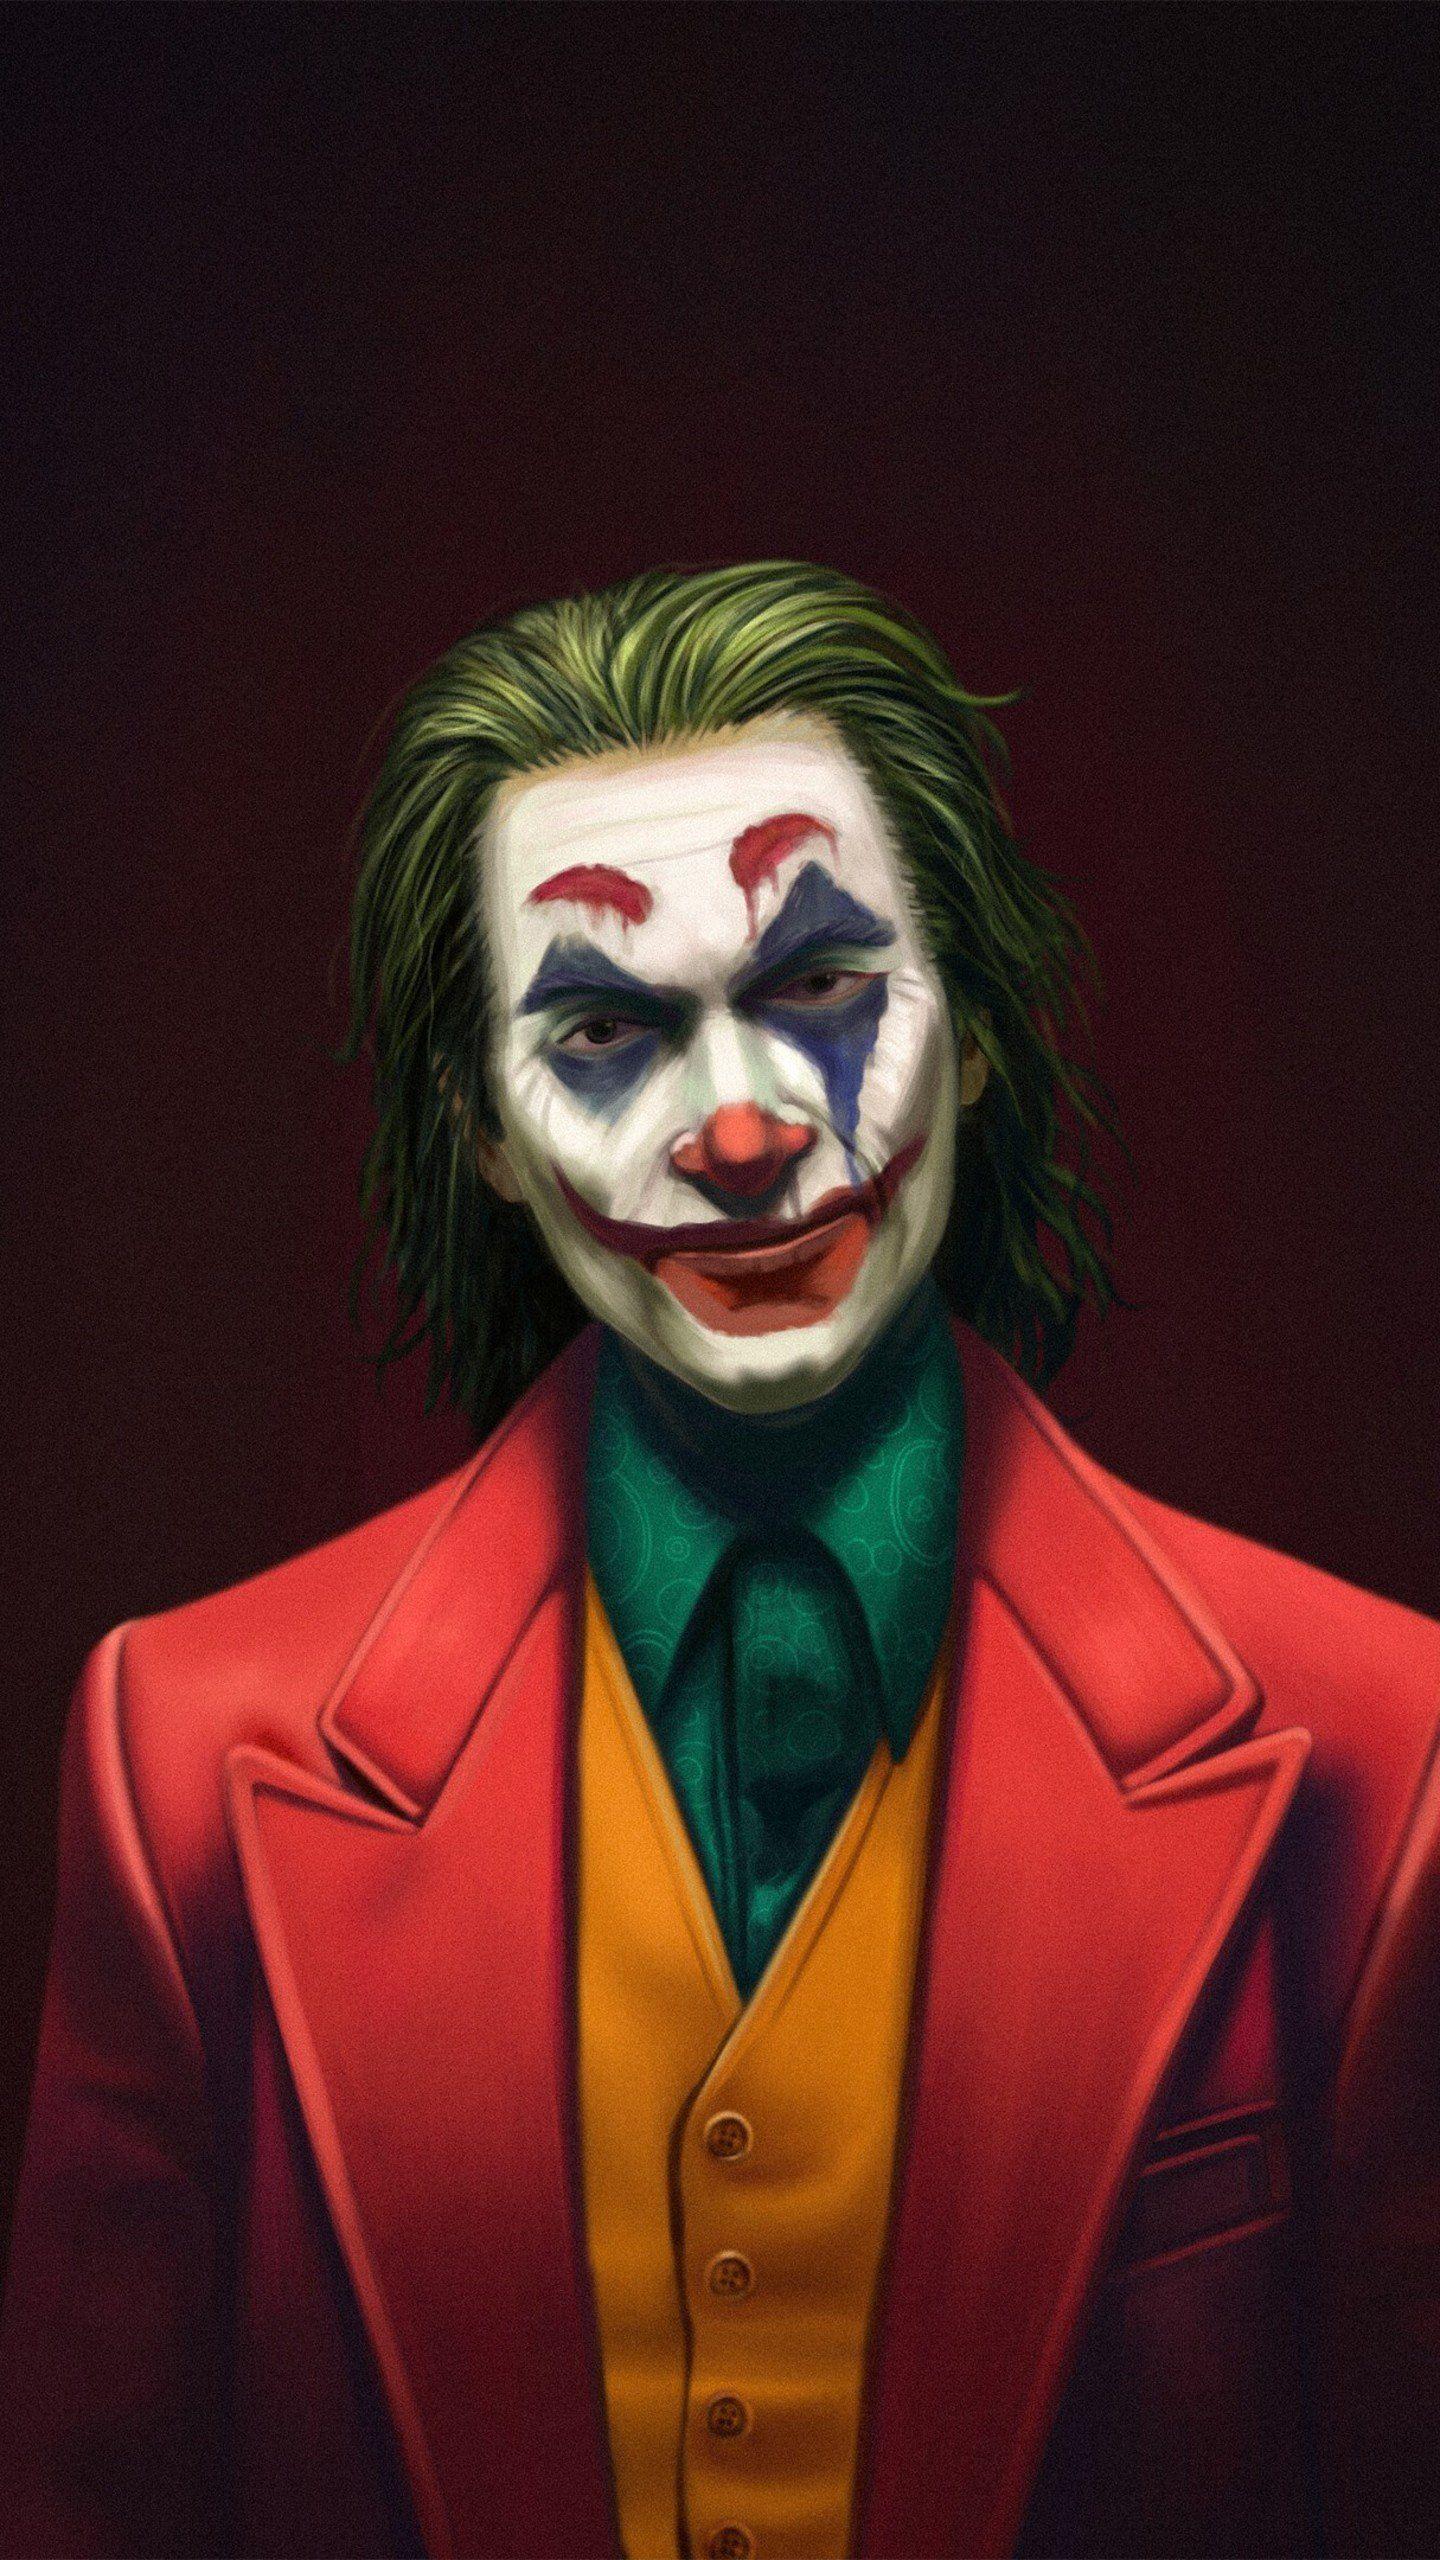 Joker Movie Wallpaper   Joker, Gambar, Wallpaper iphone